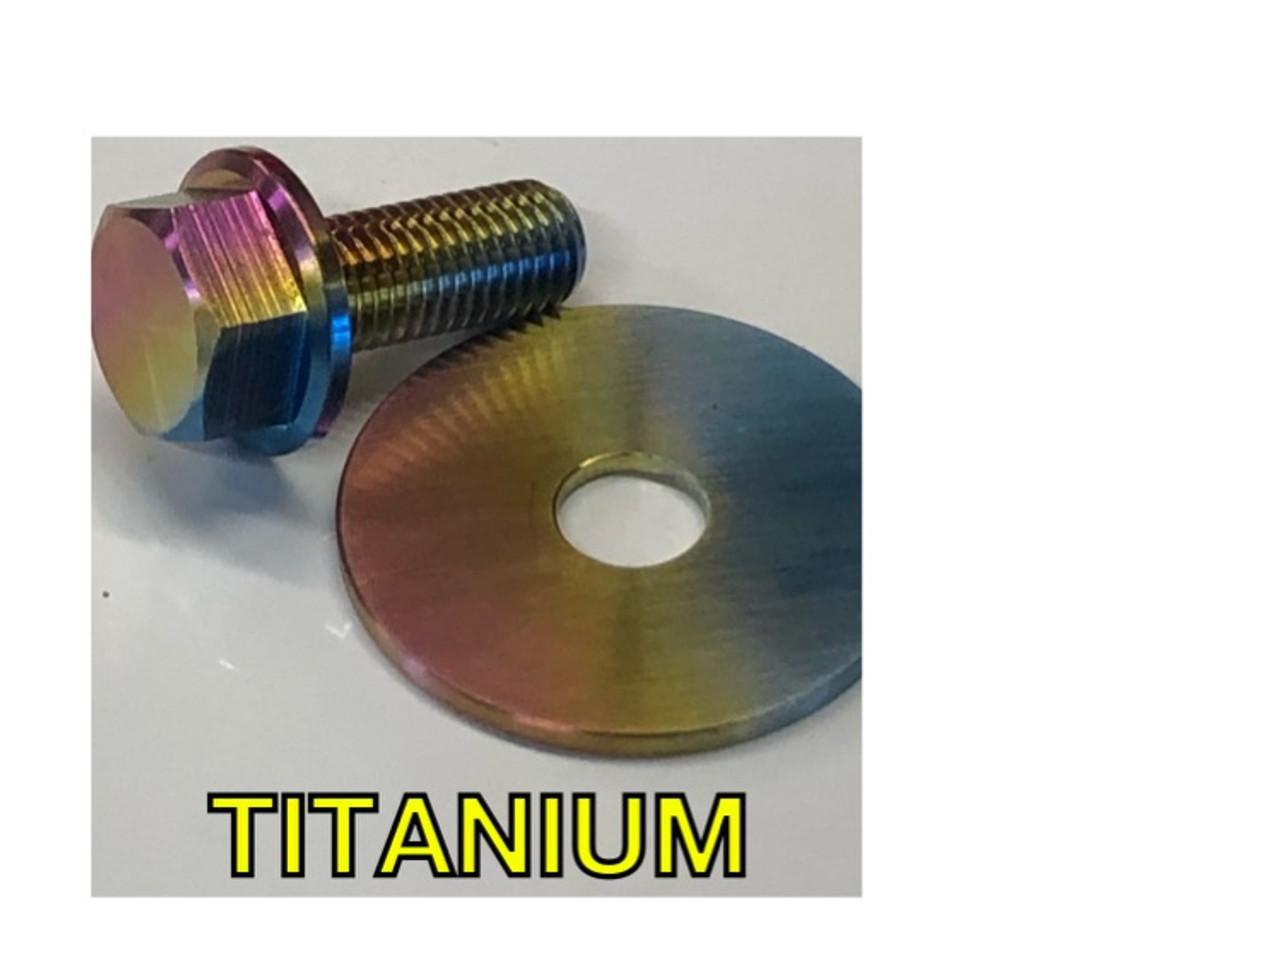 Titanium Predator 212 clutch Bolt